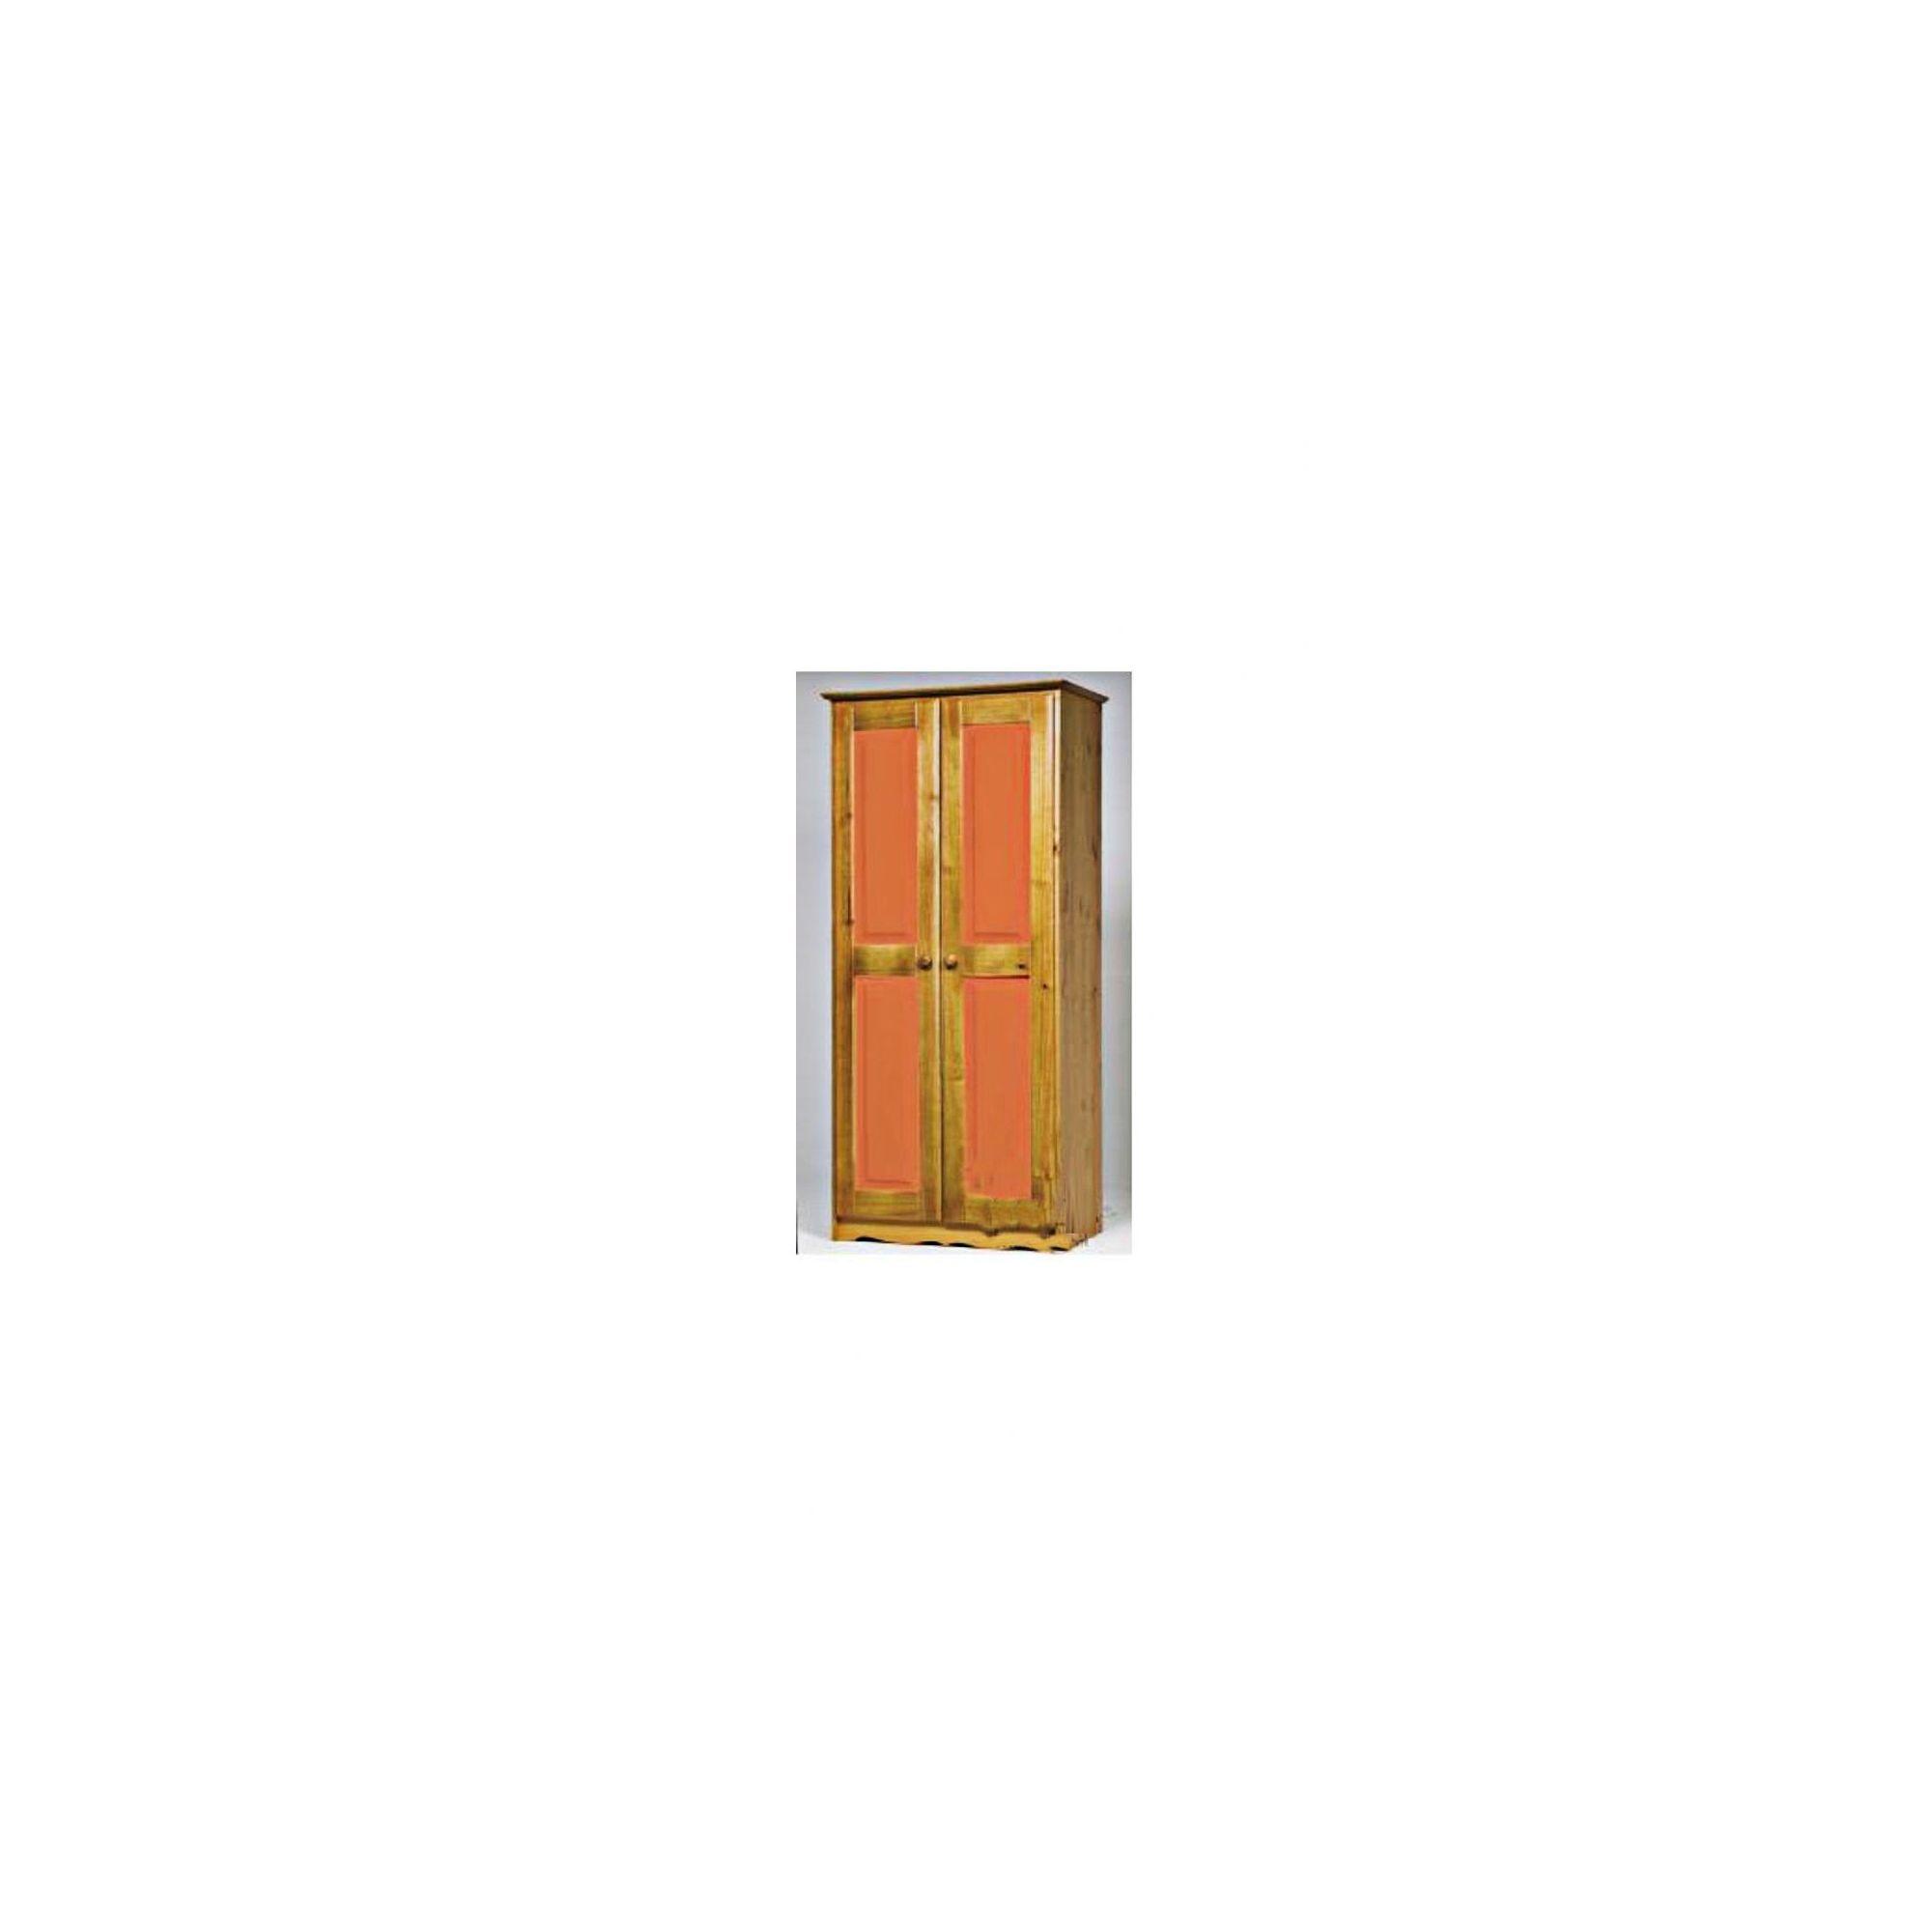 Verona 2 Door Wardrobe - Orange at Tesco Direct